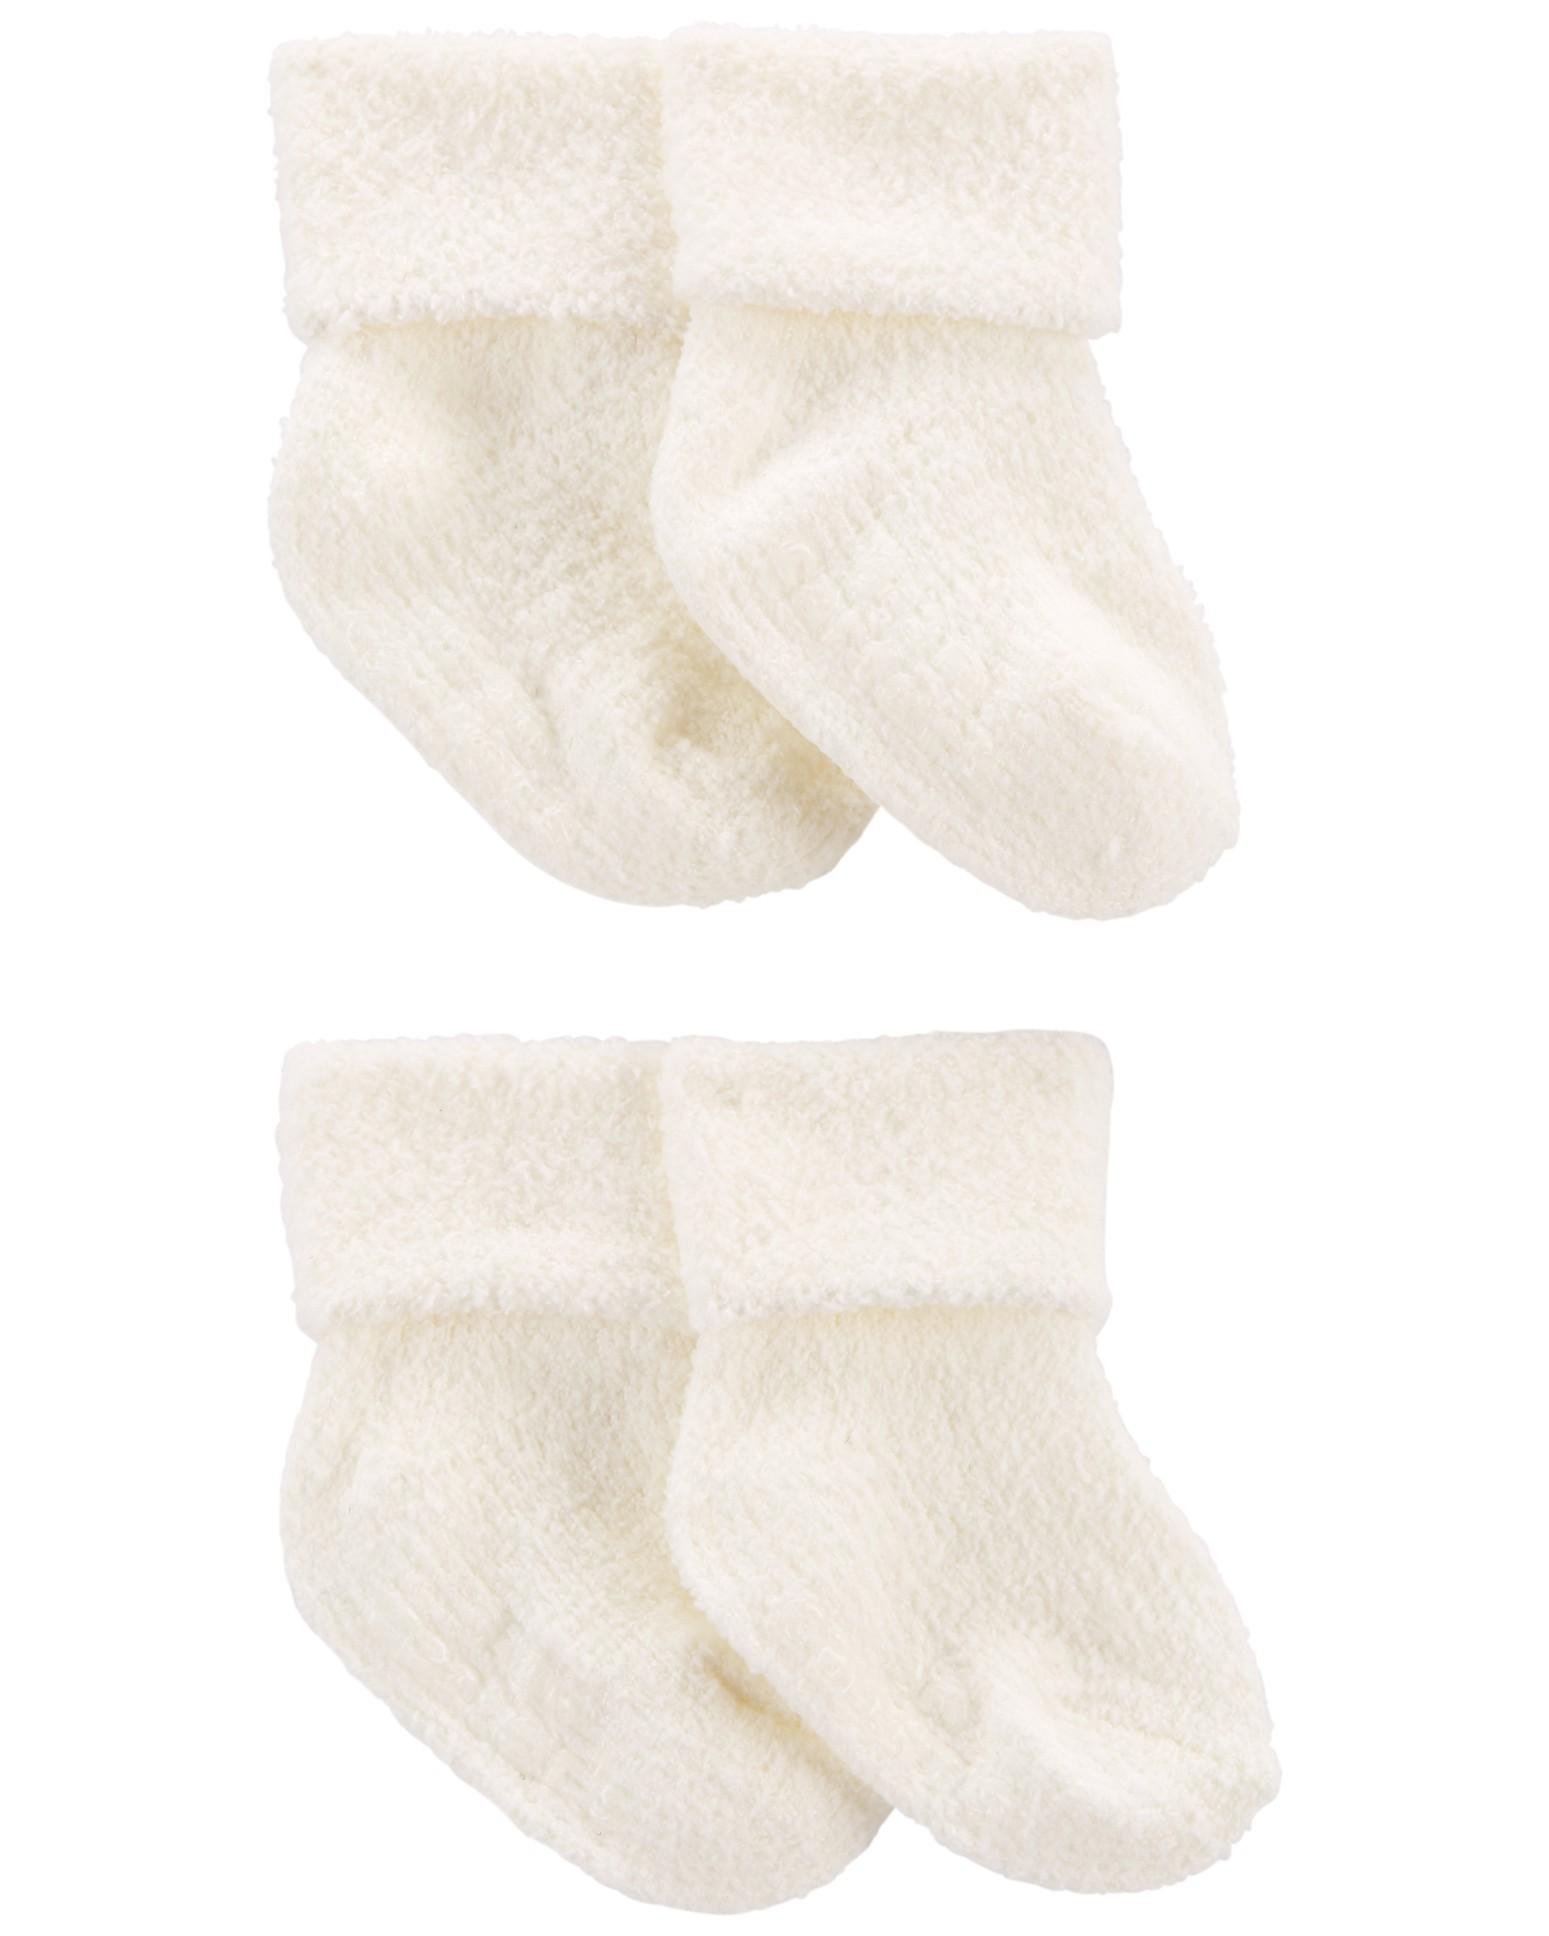 CARTER'S Ponožky White neutrál LBB 4ks NB